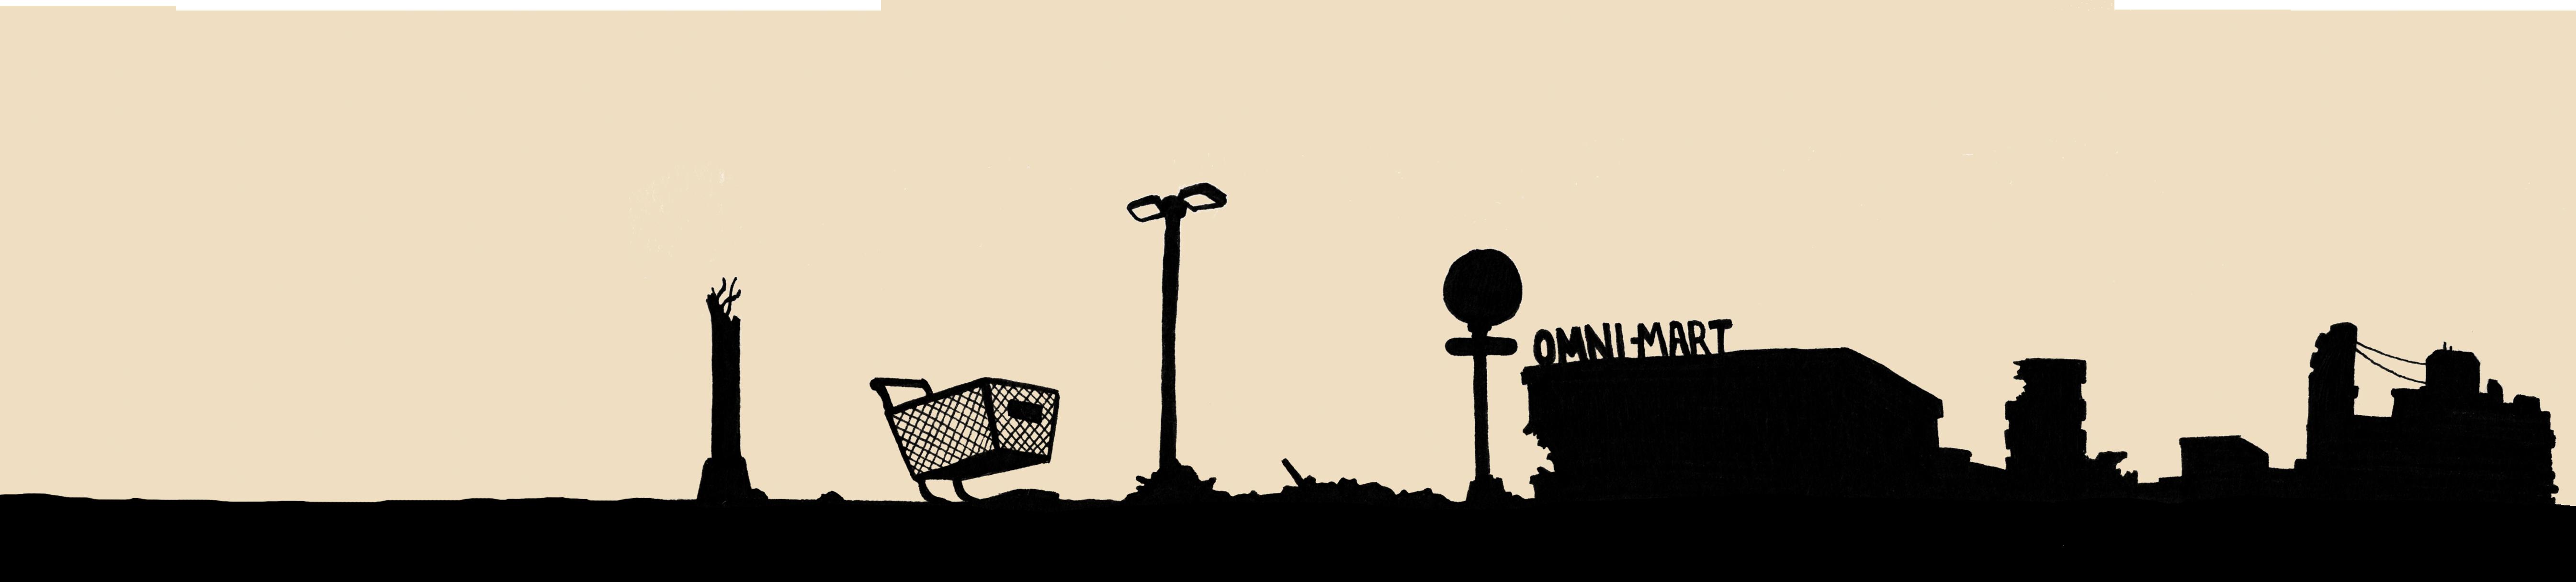 Banner_skyline transparent